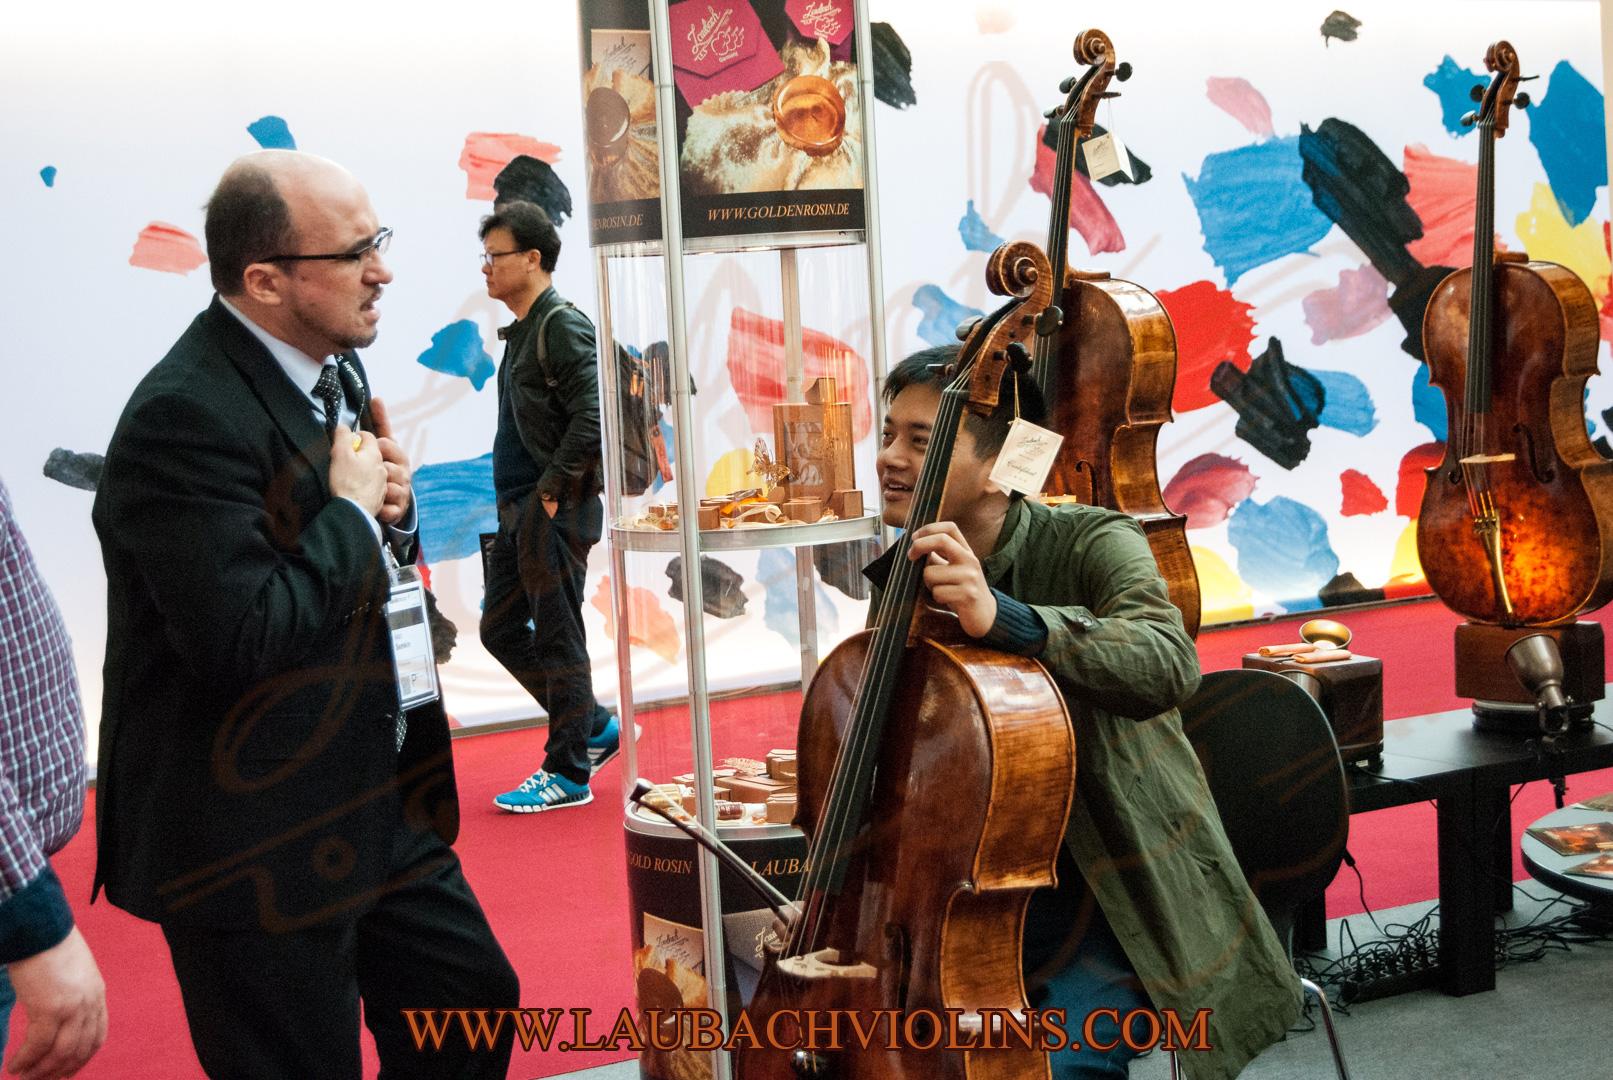 laubach_musikmesse_frankfurt_2017_15.jpg